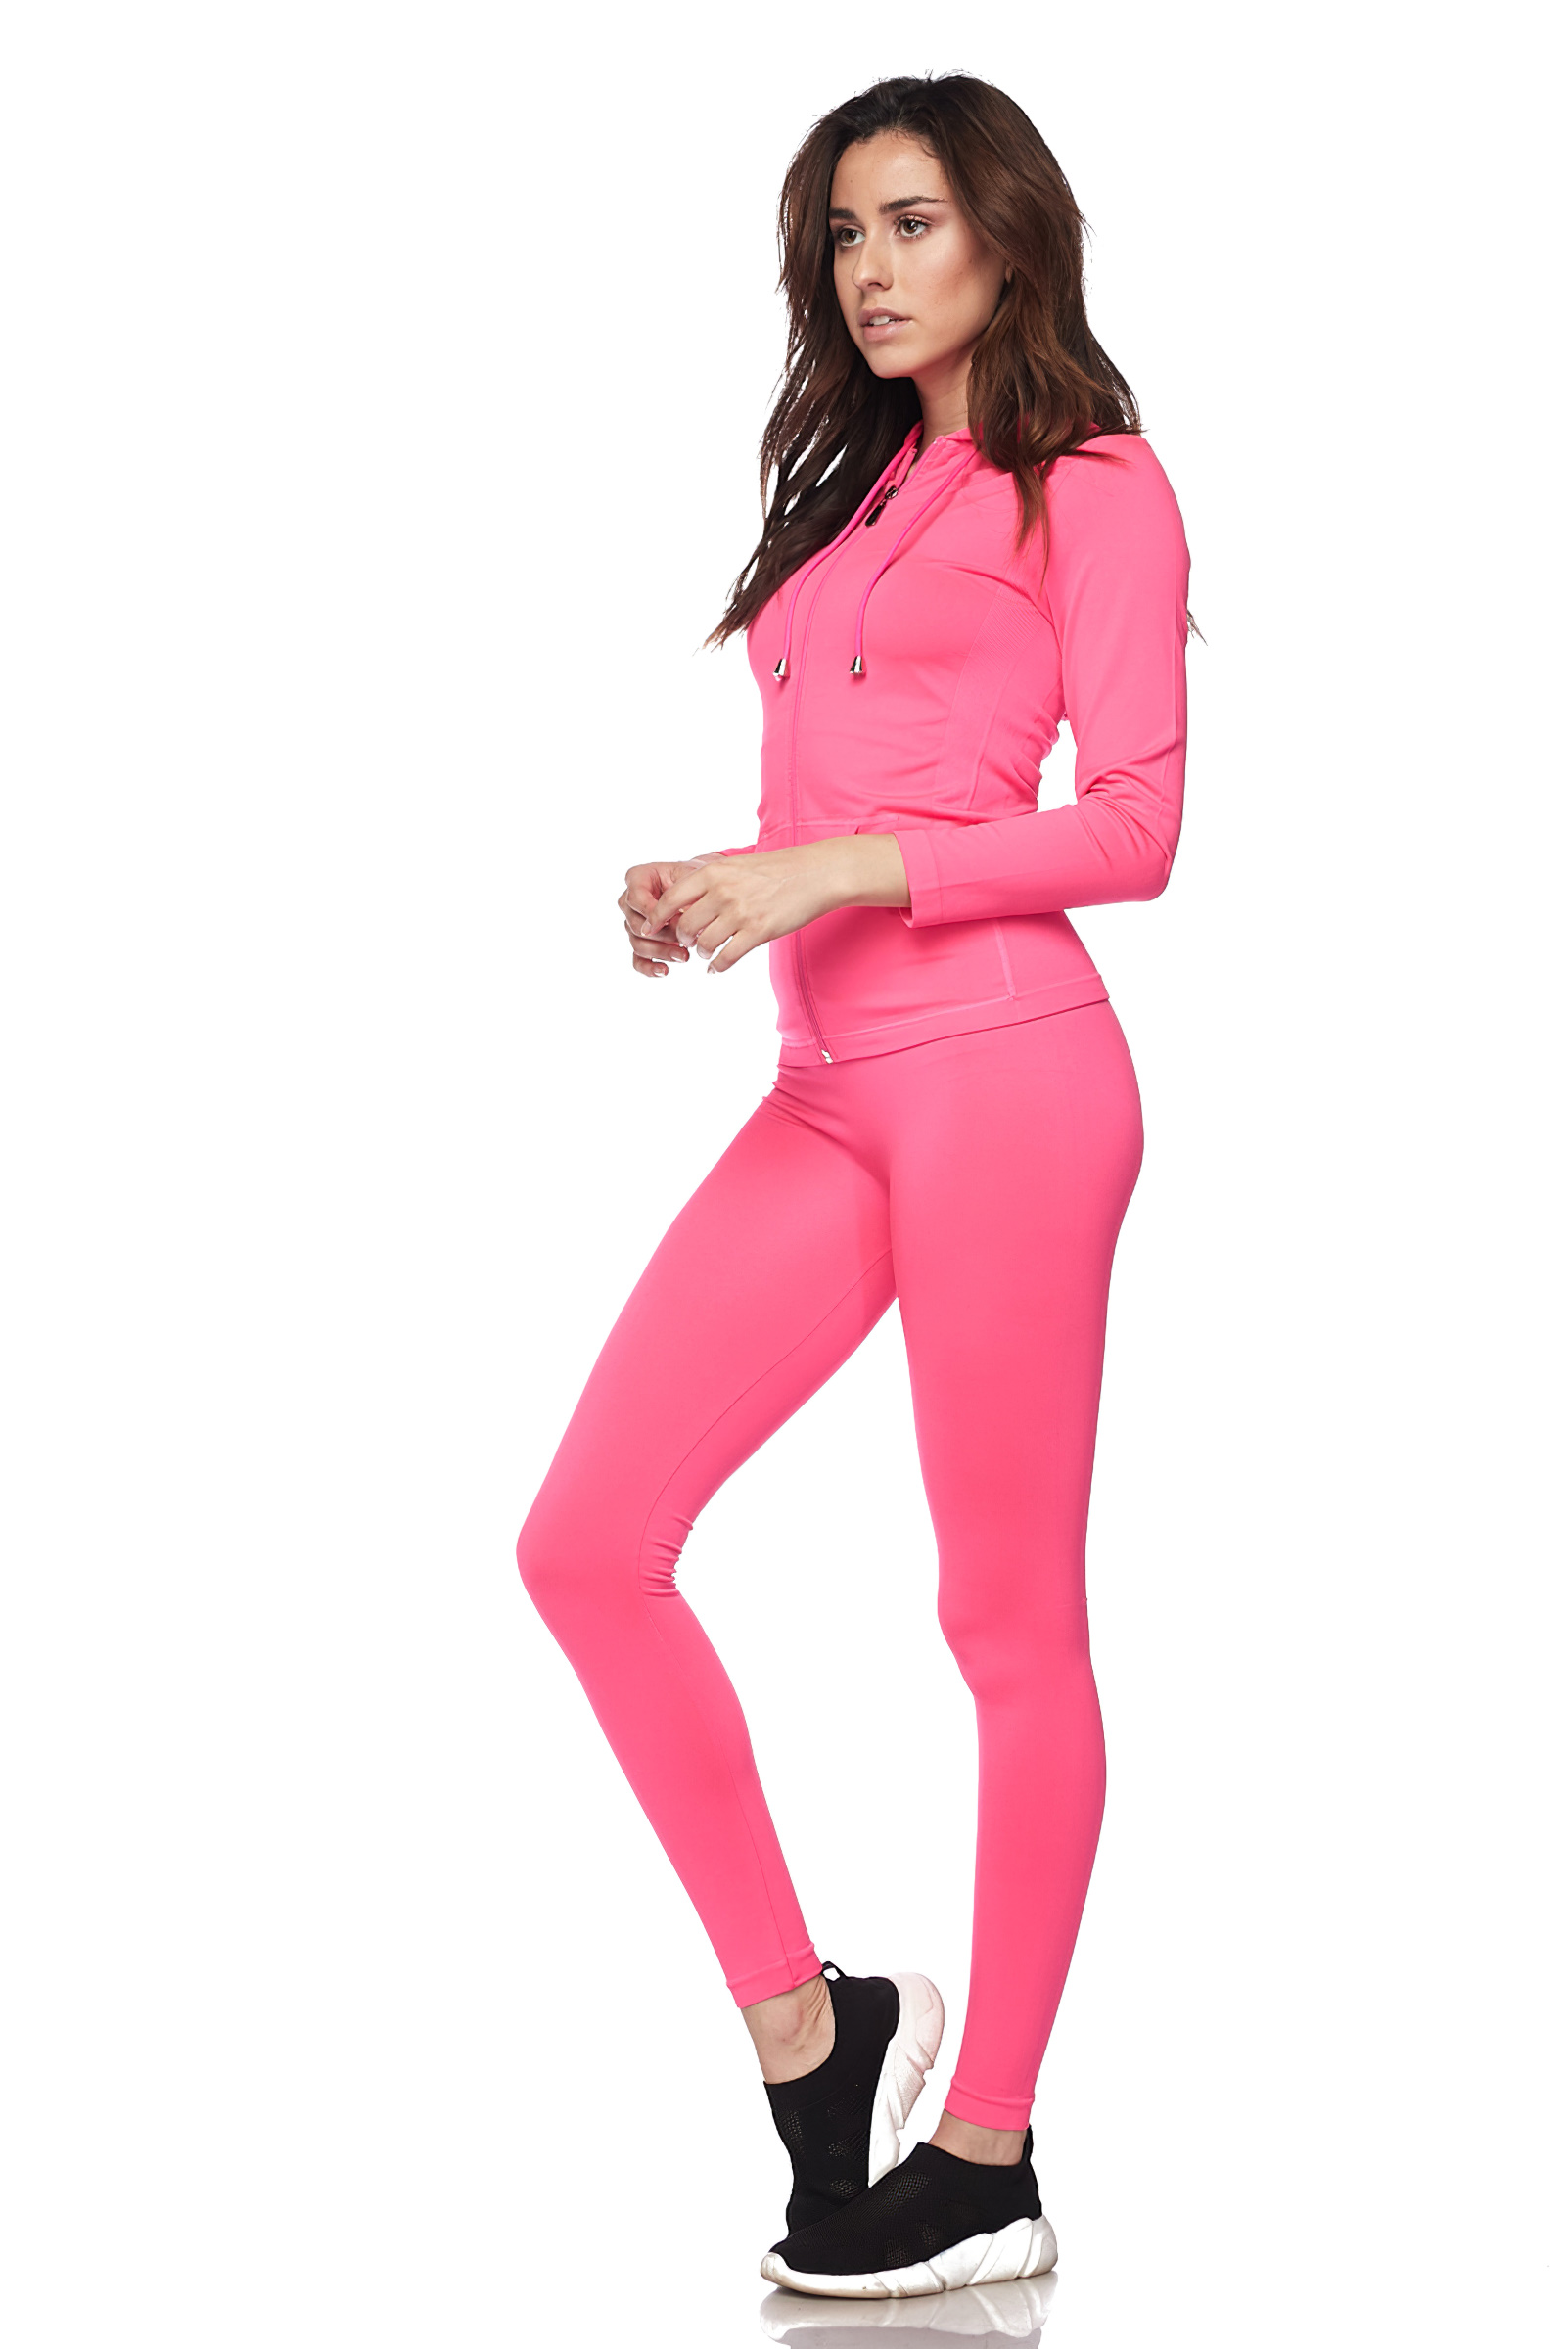 Women-039-s-Juniors-Active-Set-Wear-Zip-Up-Hoodie-and-Legging thumbnail 28